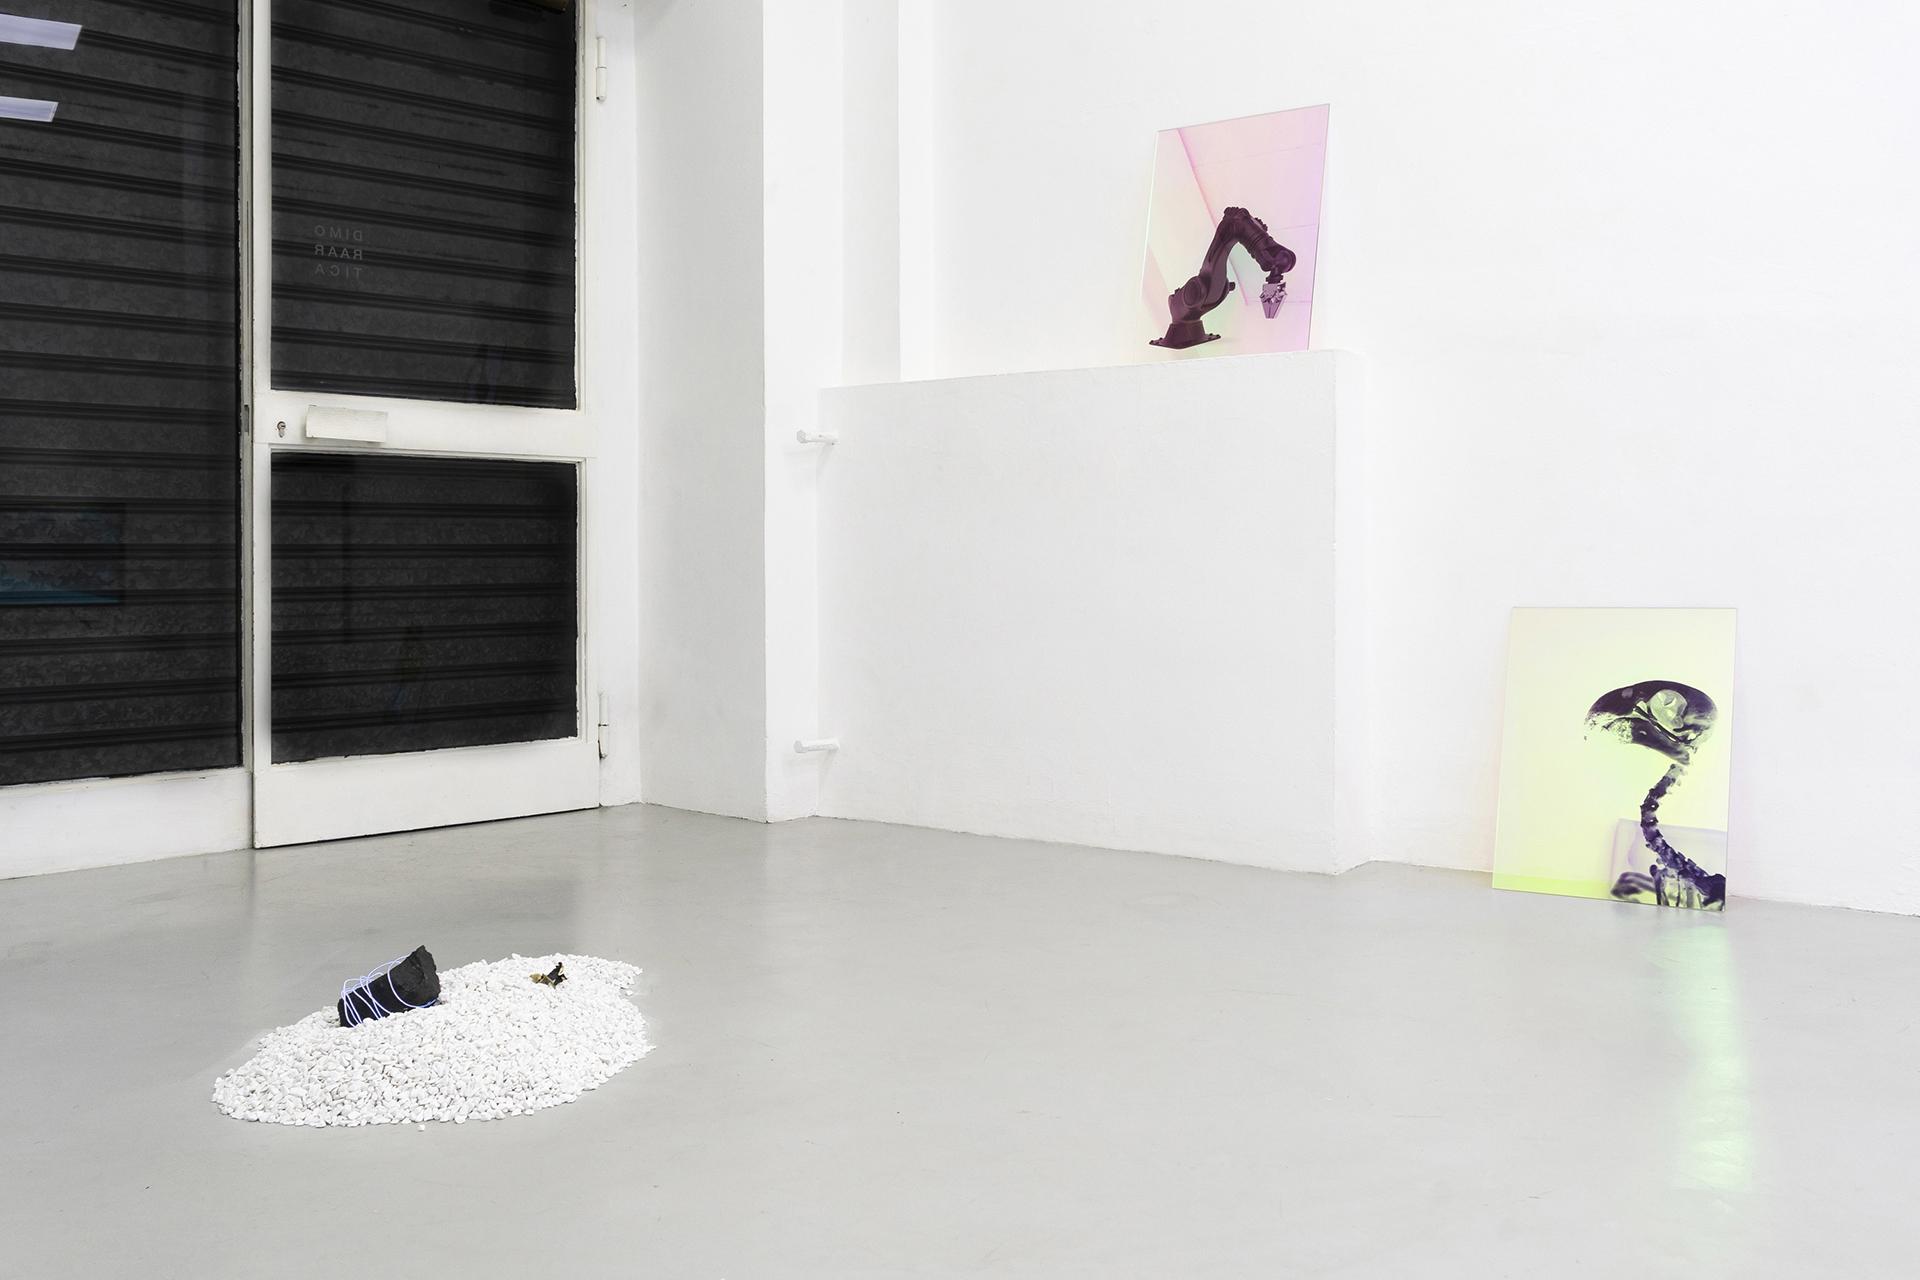 3-Paulo-Arraiano,-Sensorial-Divinities.-2019.-Exhibition-view.-Dimora-Artica-(ph-Cesare-Lopopolo).jpg